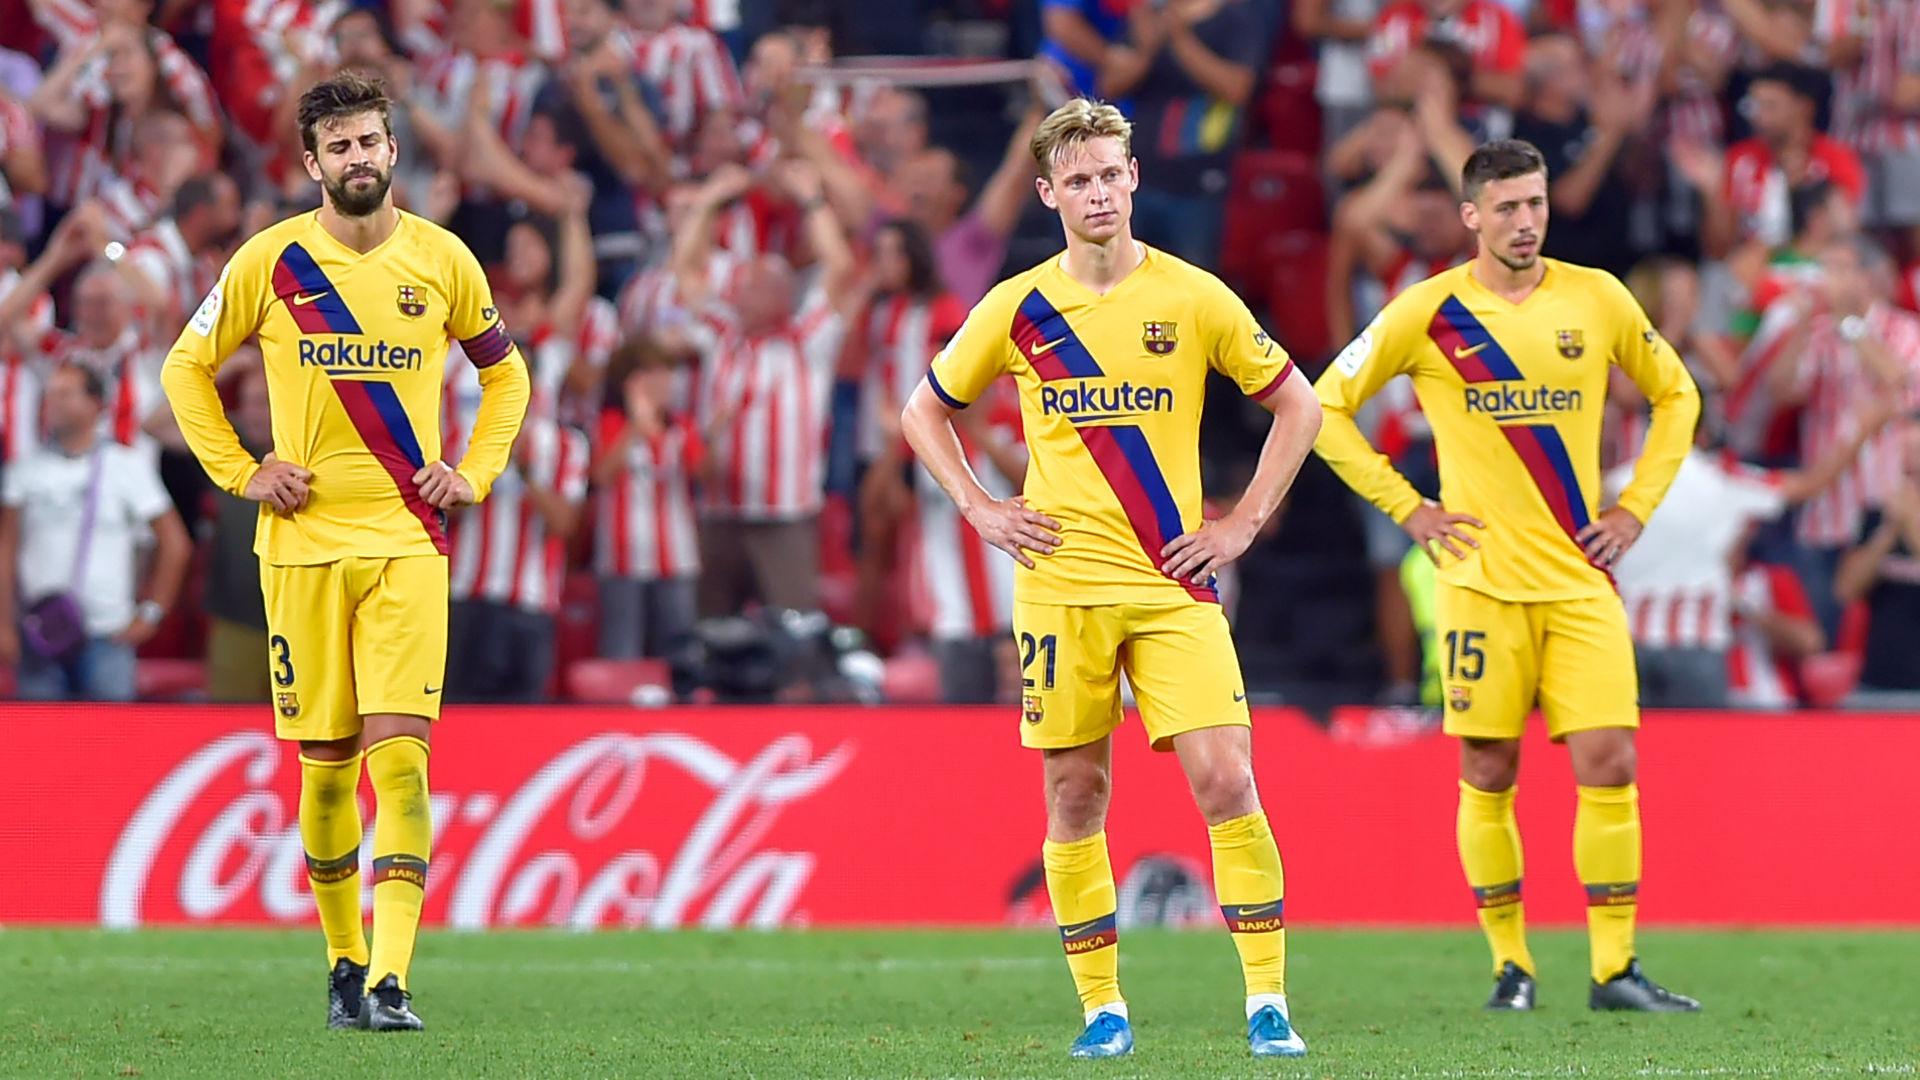 LA LIGA: Bercelona at home to Bilbao hoping to retain top ...